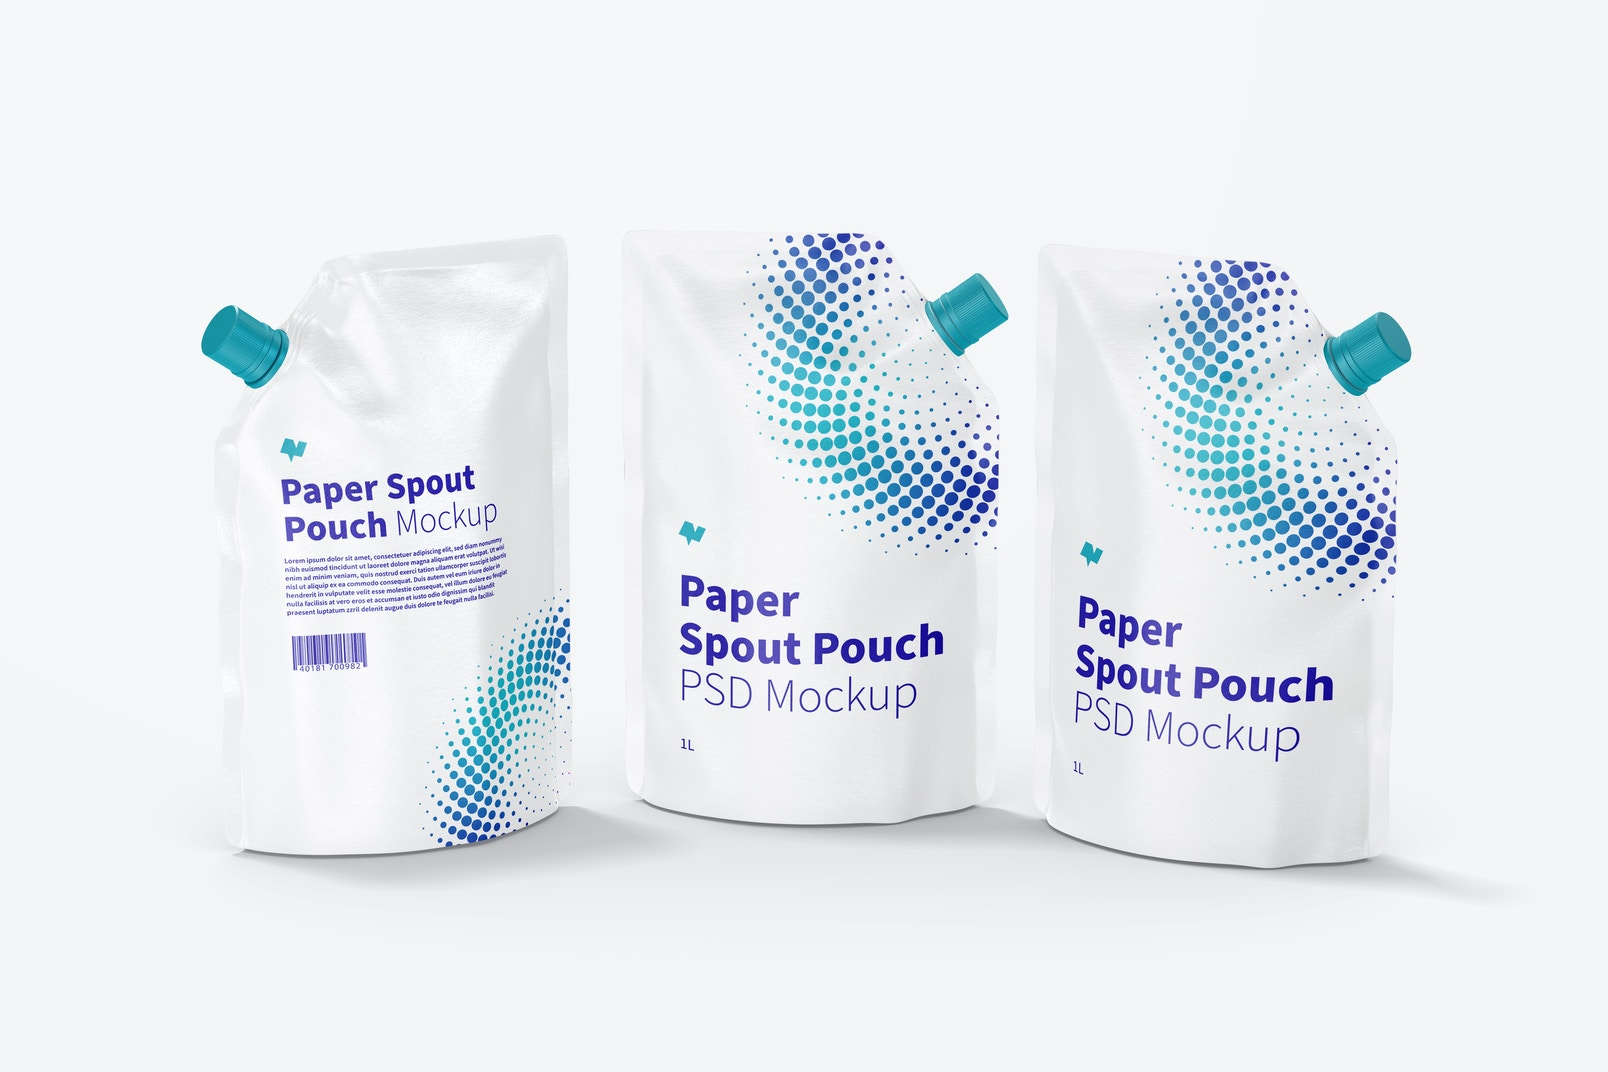 1 Liter Paper Spout Pouches Mockup